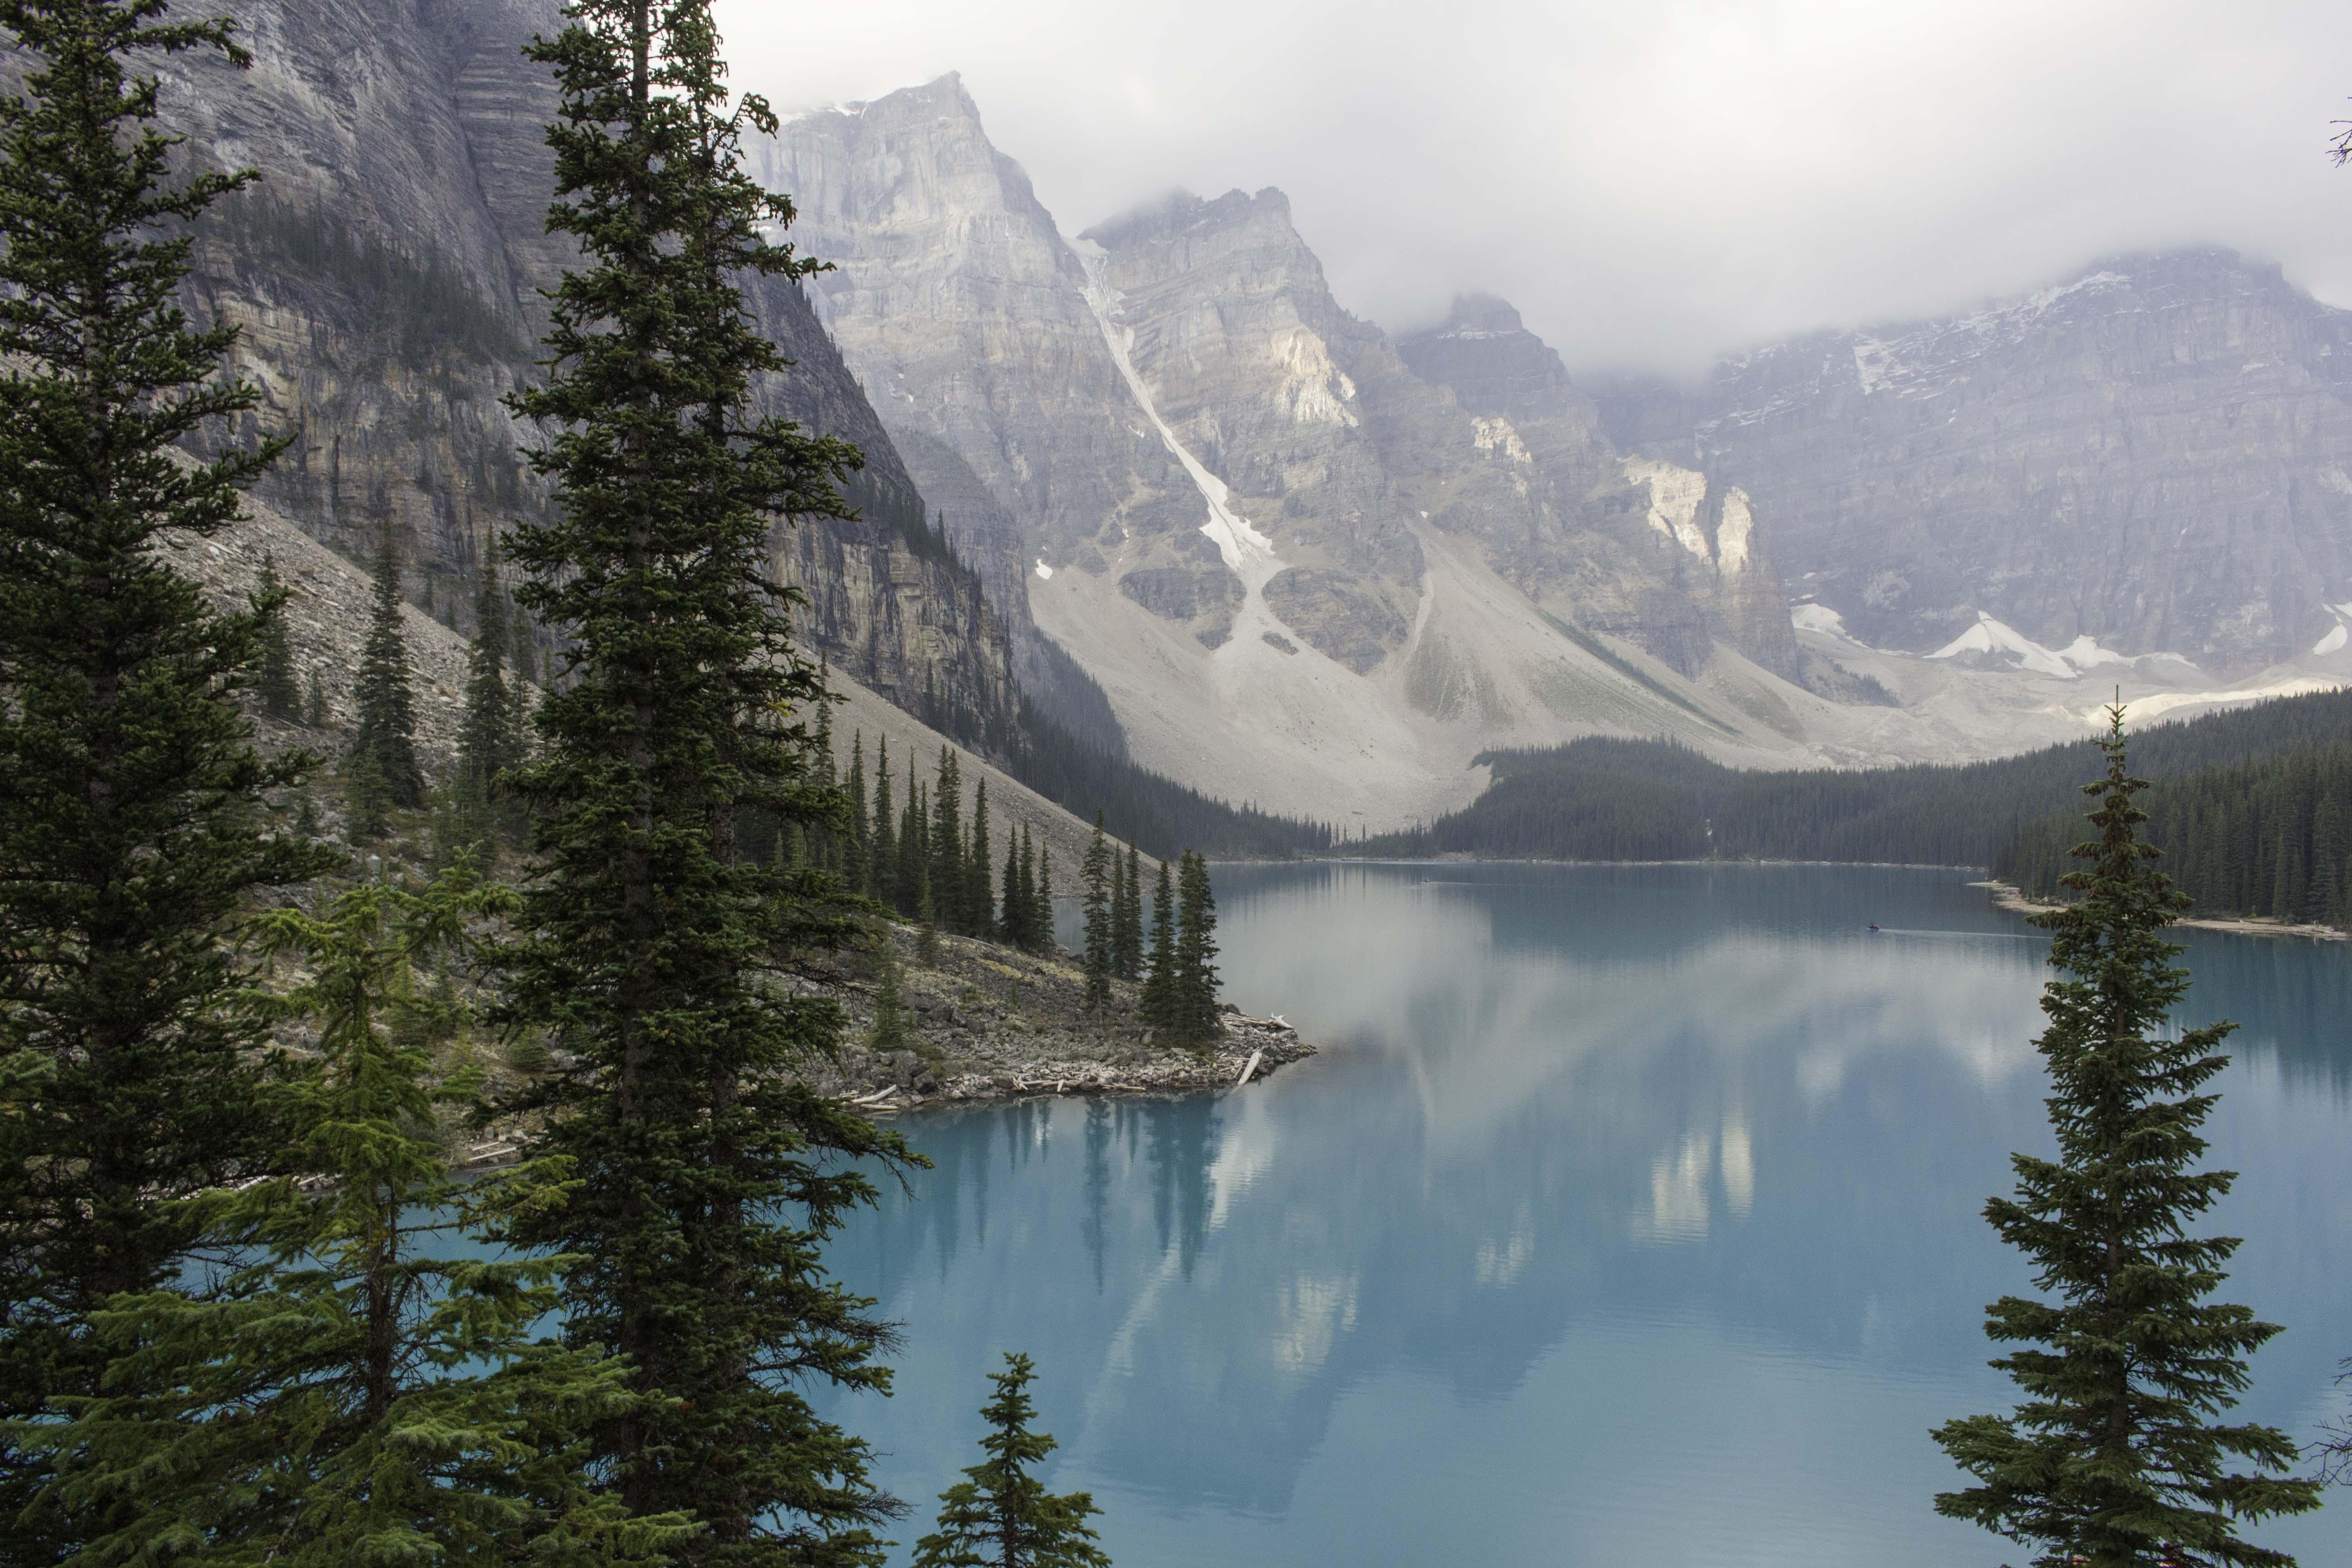 Canadian Rockies, Aug-Sept 2018